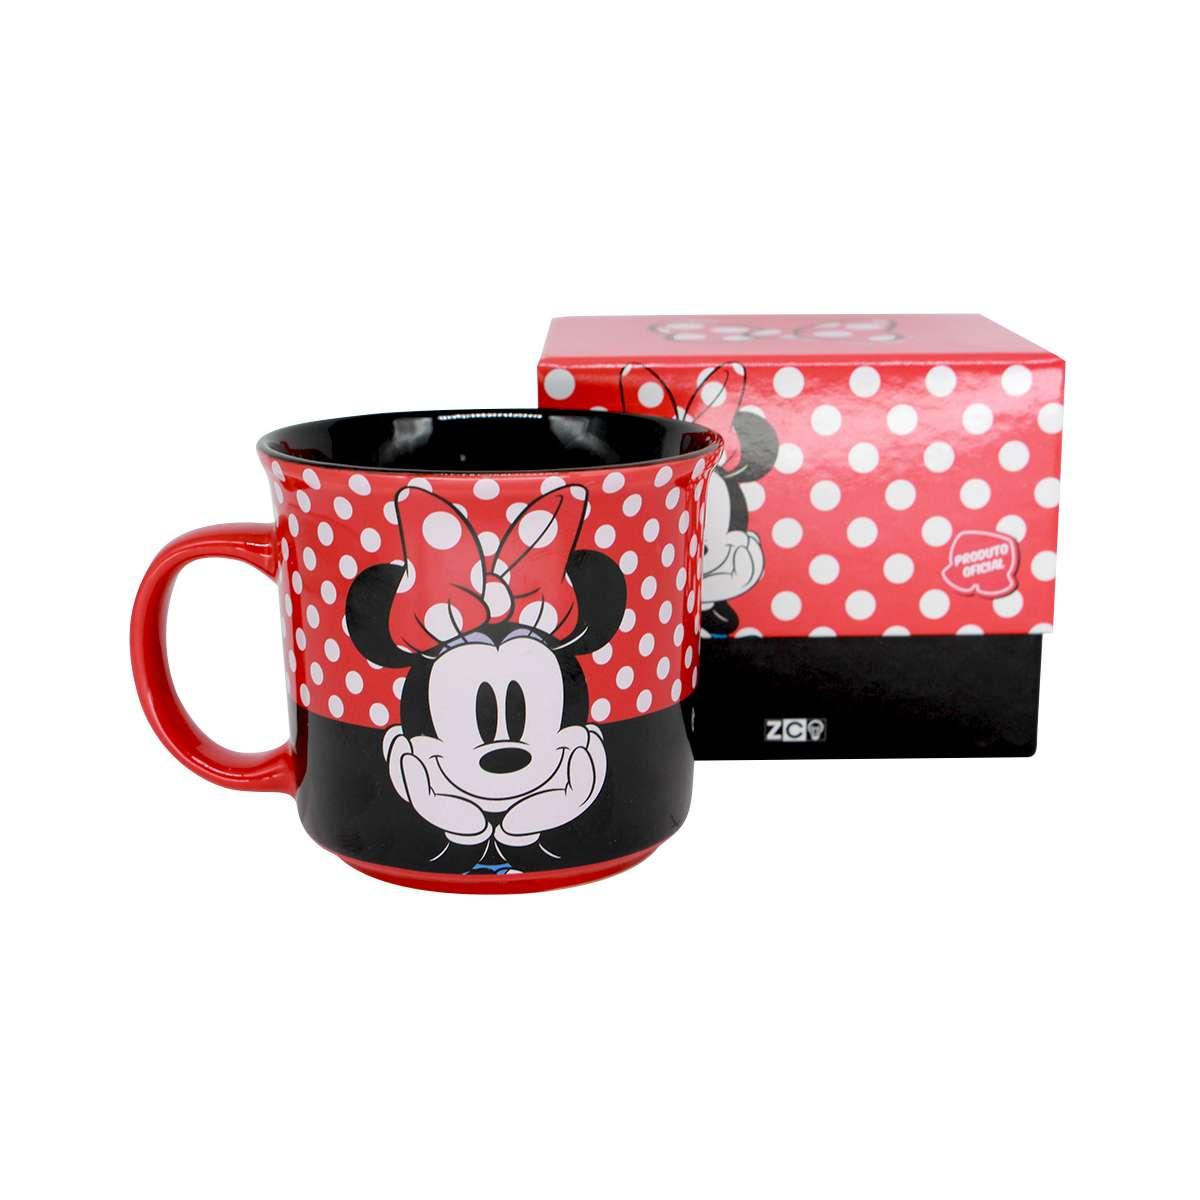 Caneca Minnie Poa Mickey Mouse Disney